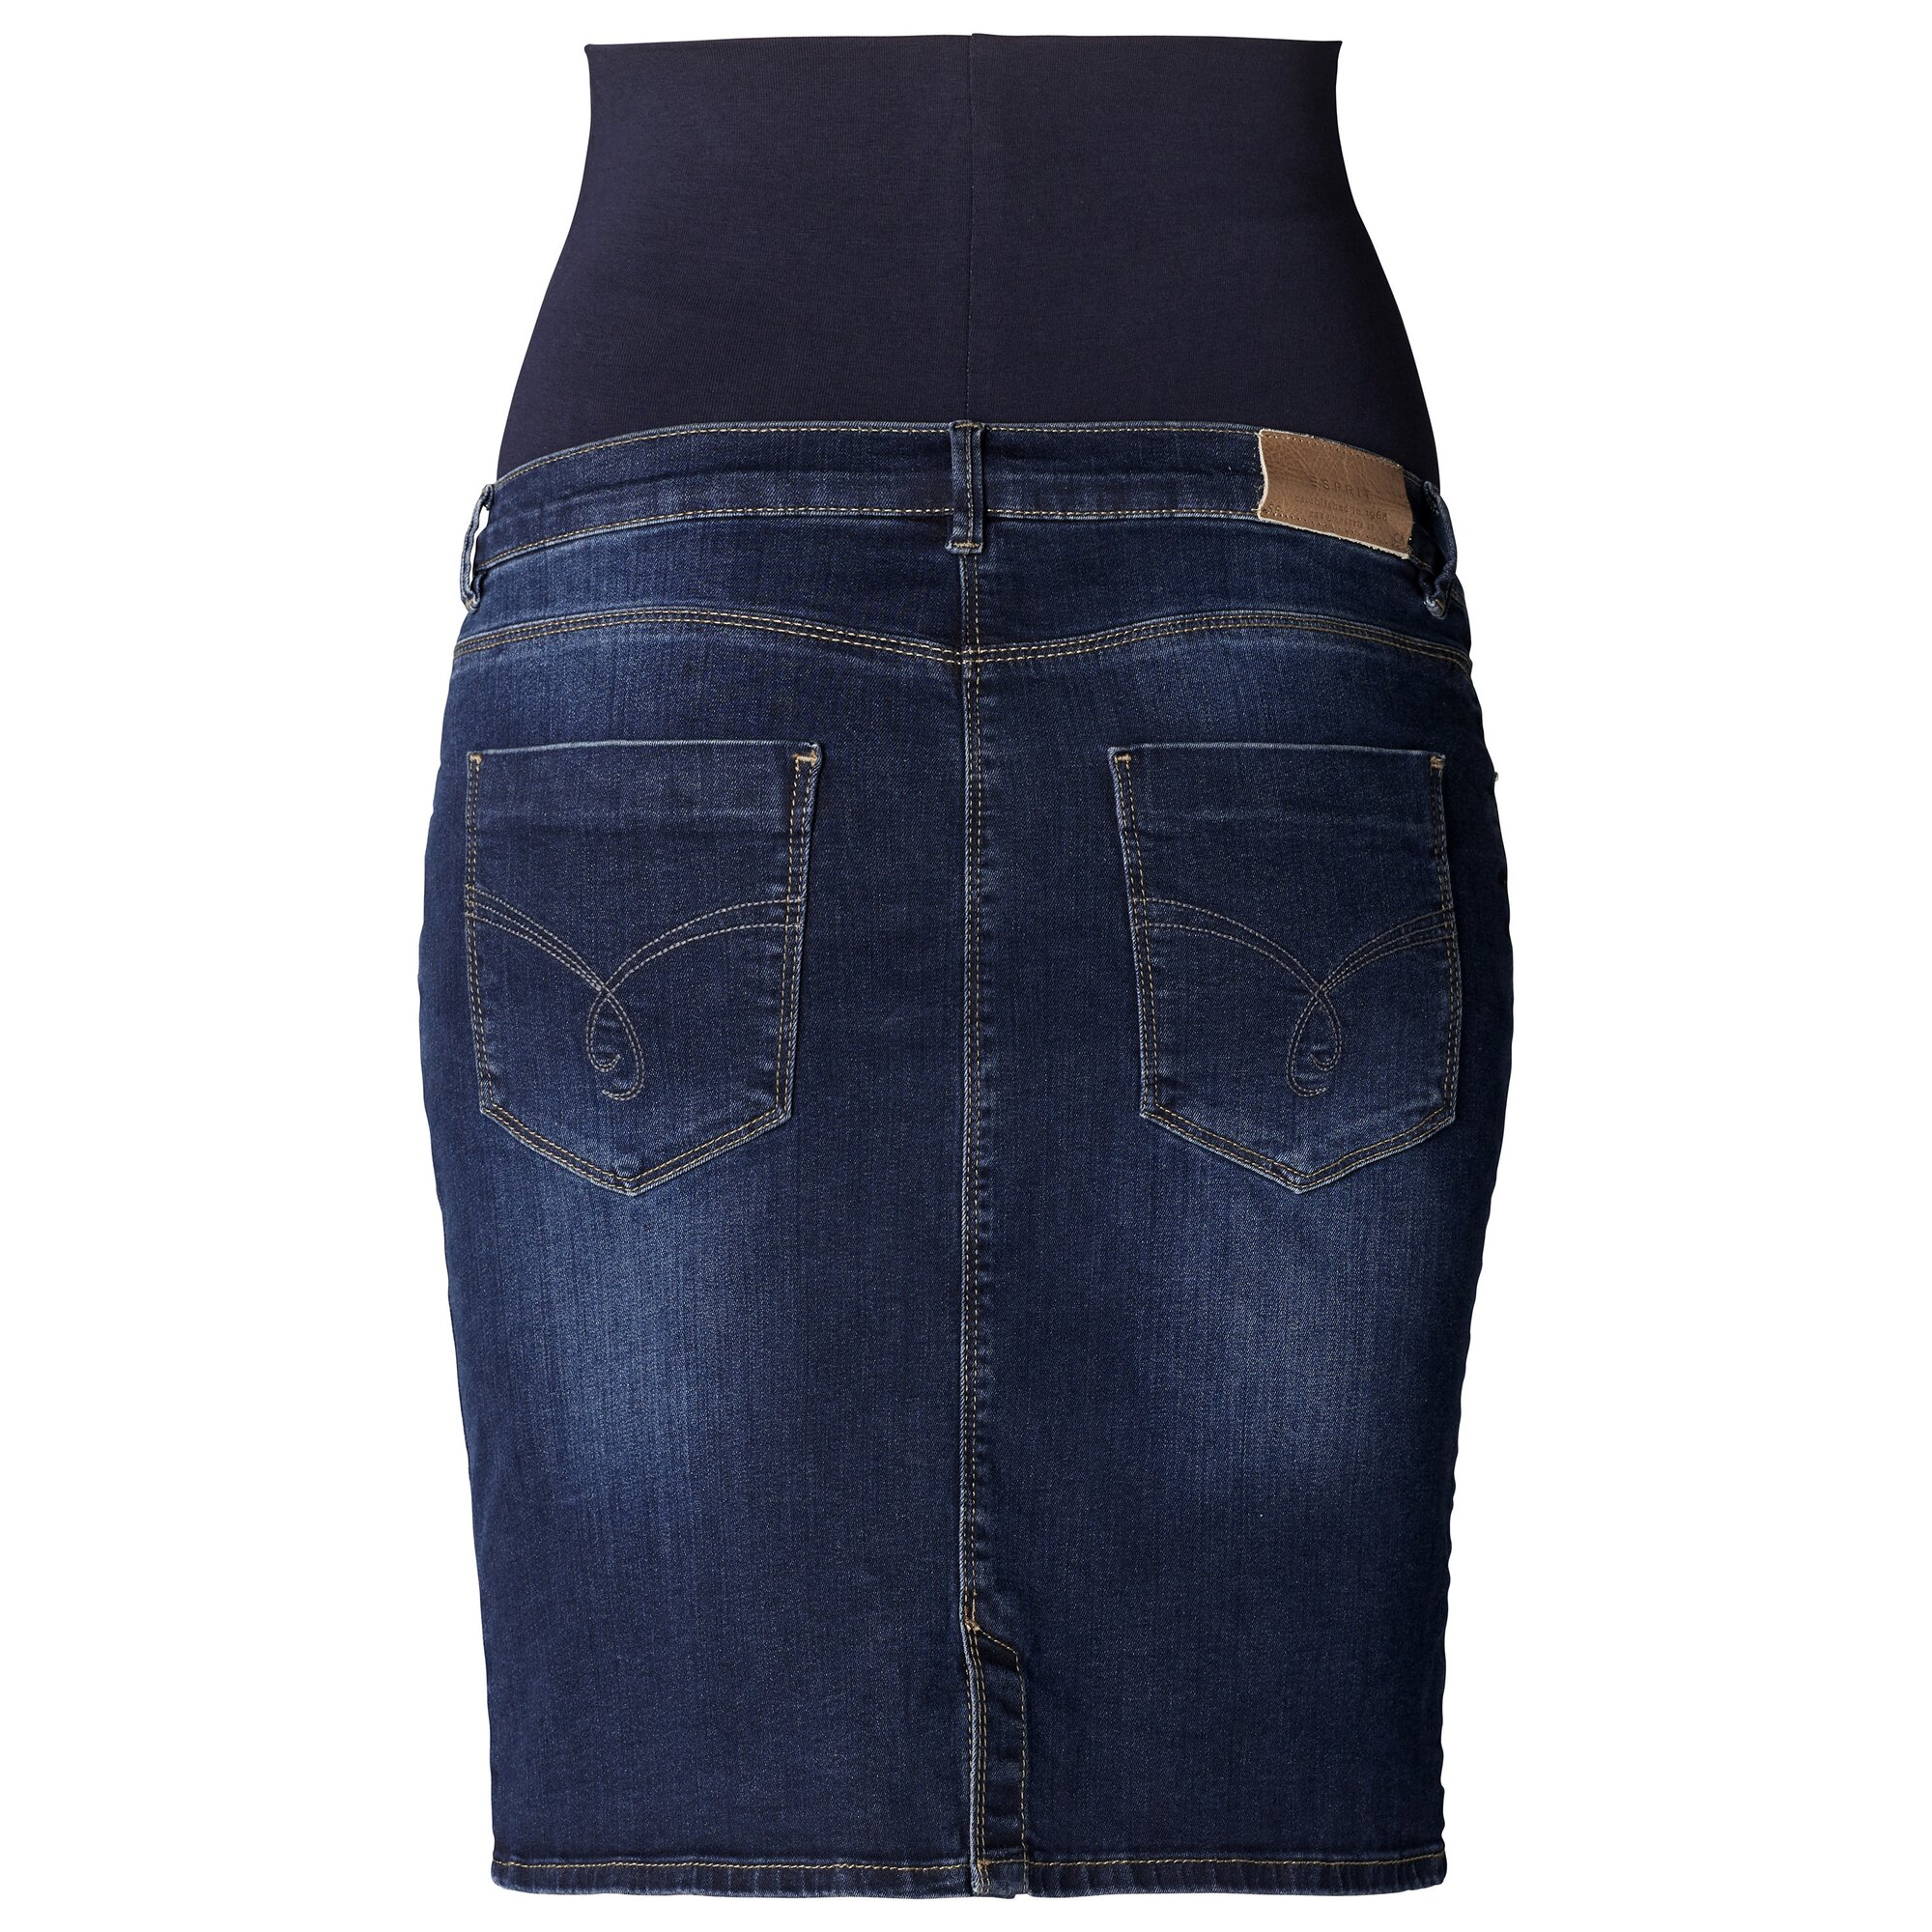 esprit-umstandsrock-jeans